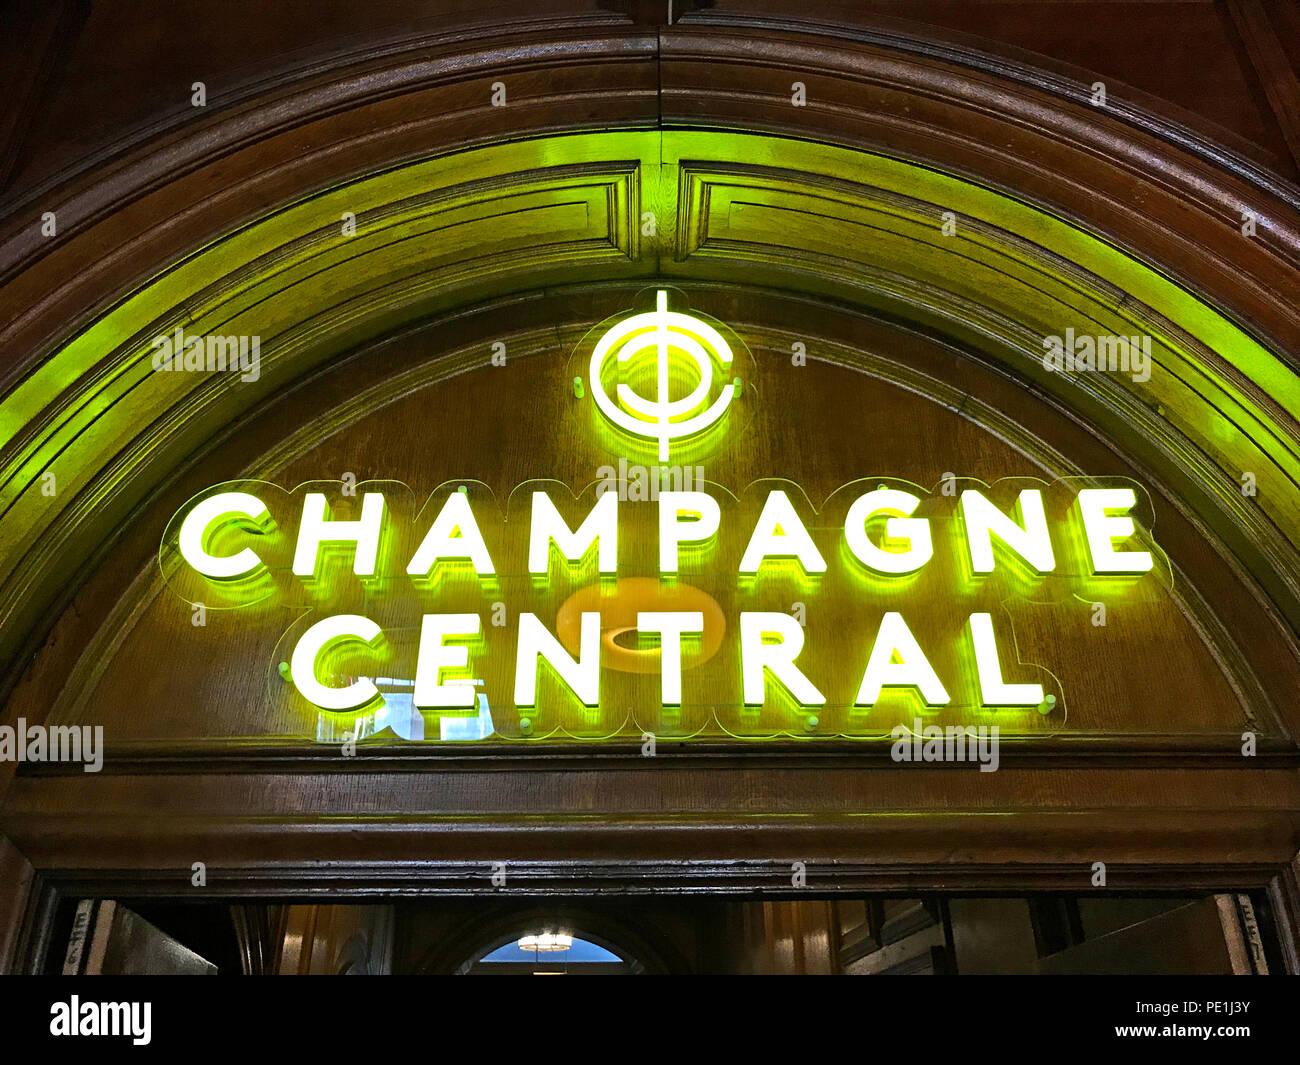 GoTonySmith @HotpixUK,GoTonySmith,@HotpixUK,Central,Gordon St,Gordon Street,city centre,transport,train,trains,Scotrail,Champagne Bar